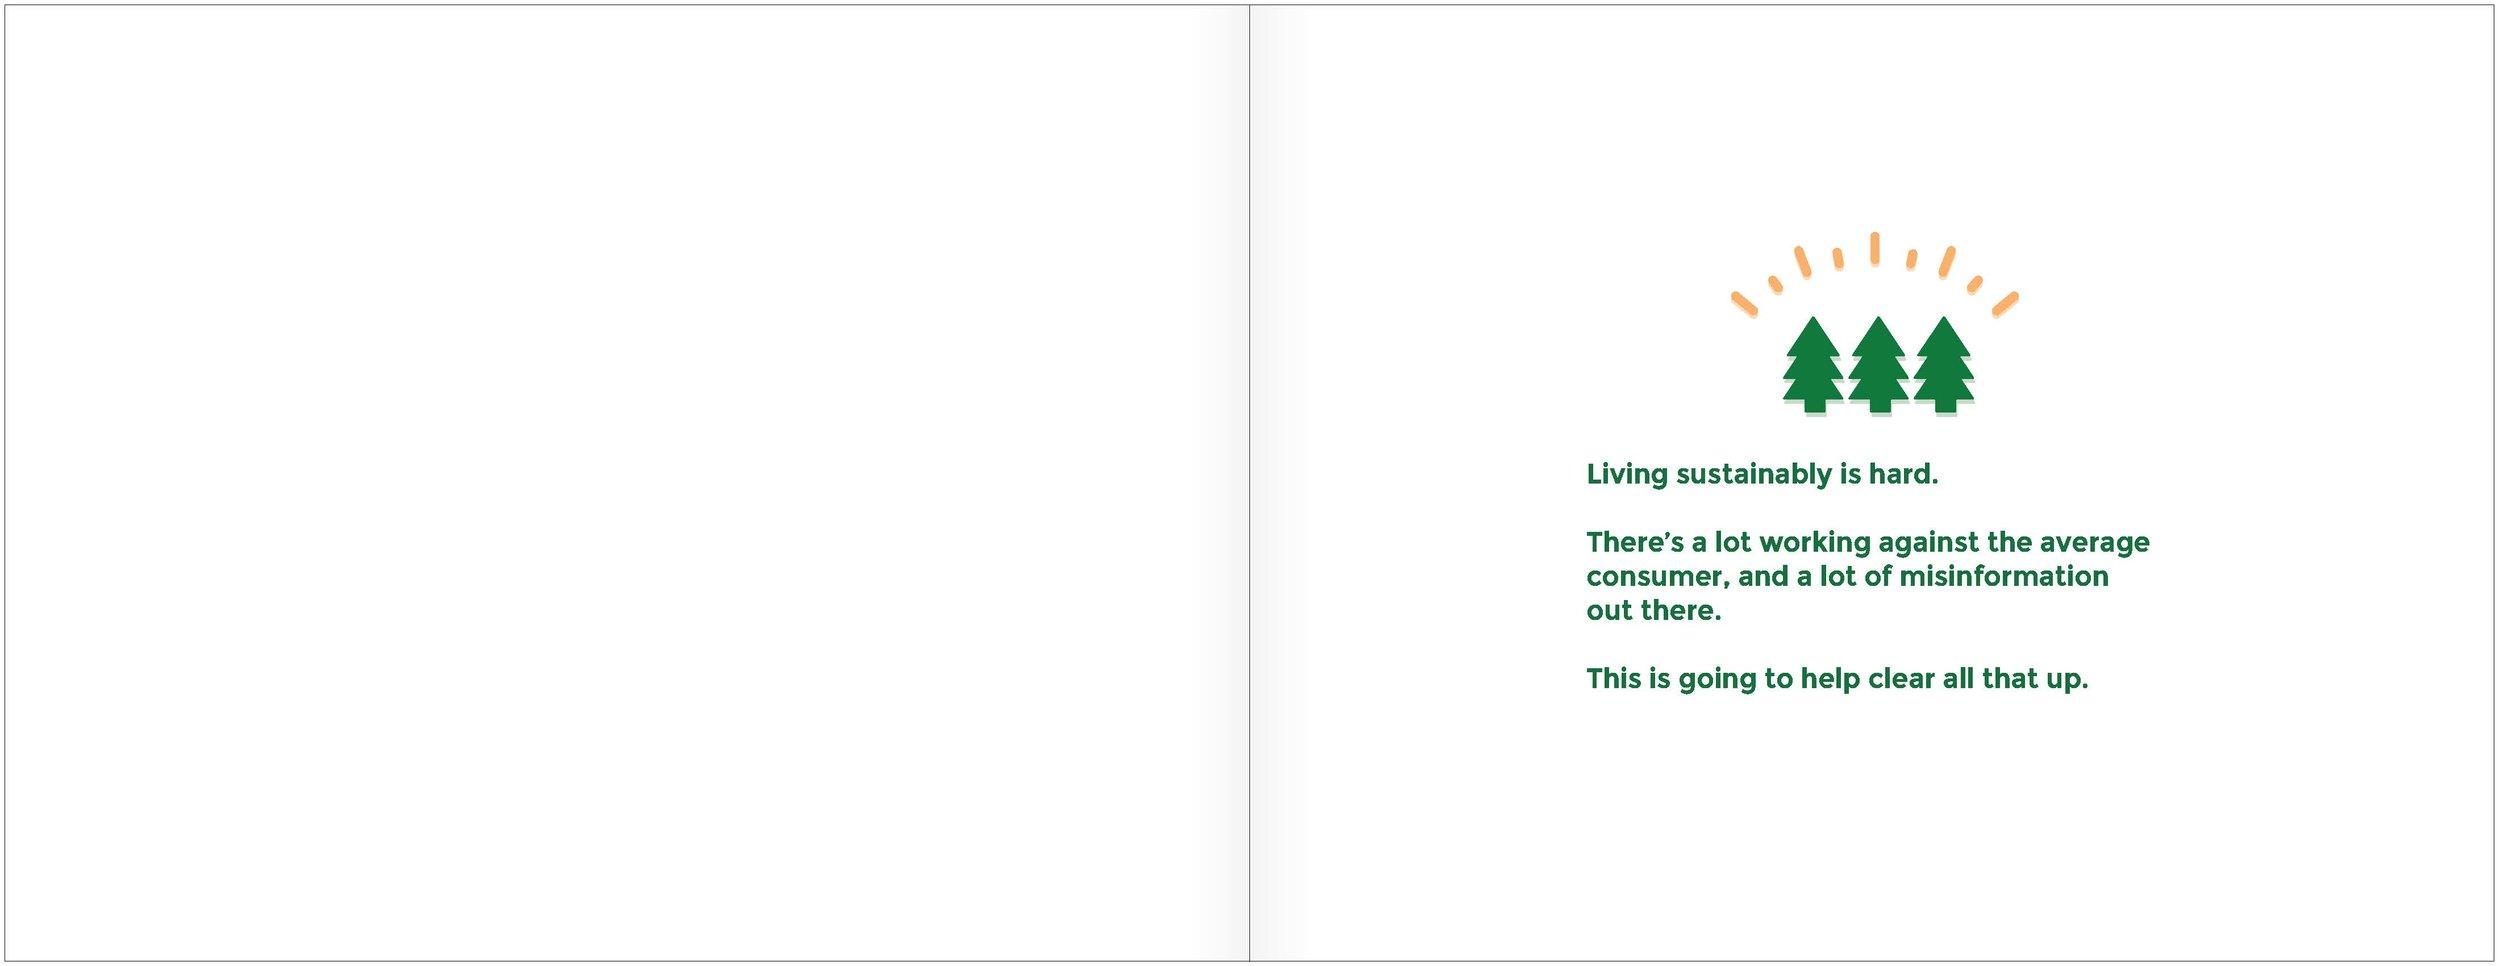 1B1B Process Book copy_Page_02.jpg